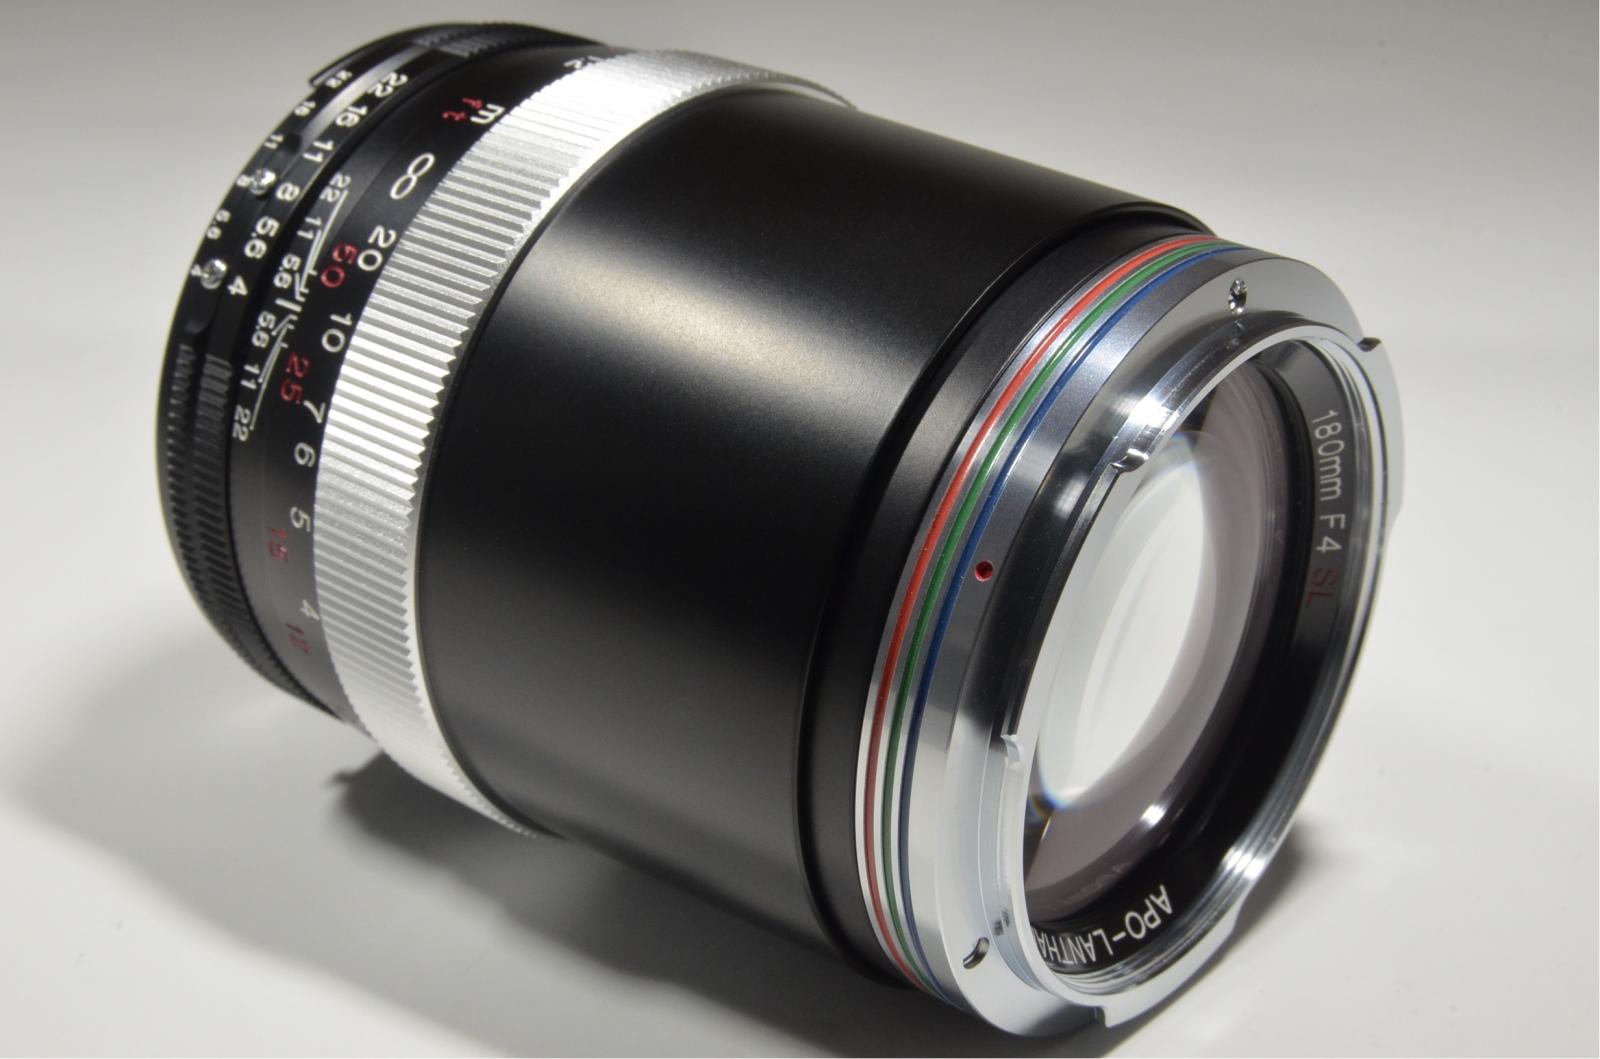 voigtlander apo-lanthar 180mm f4 sl for ai-s nikon